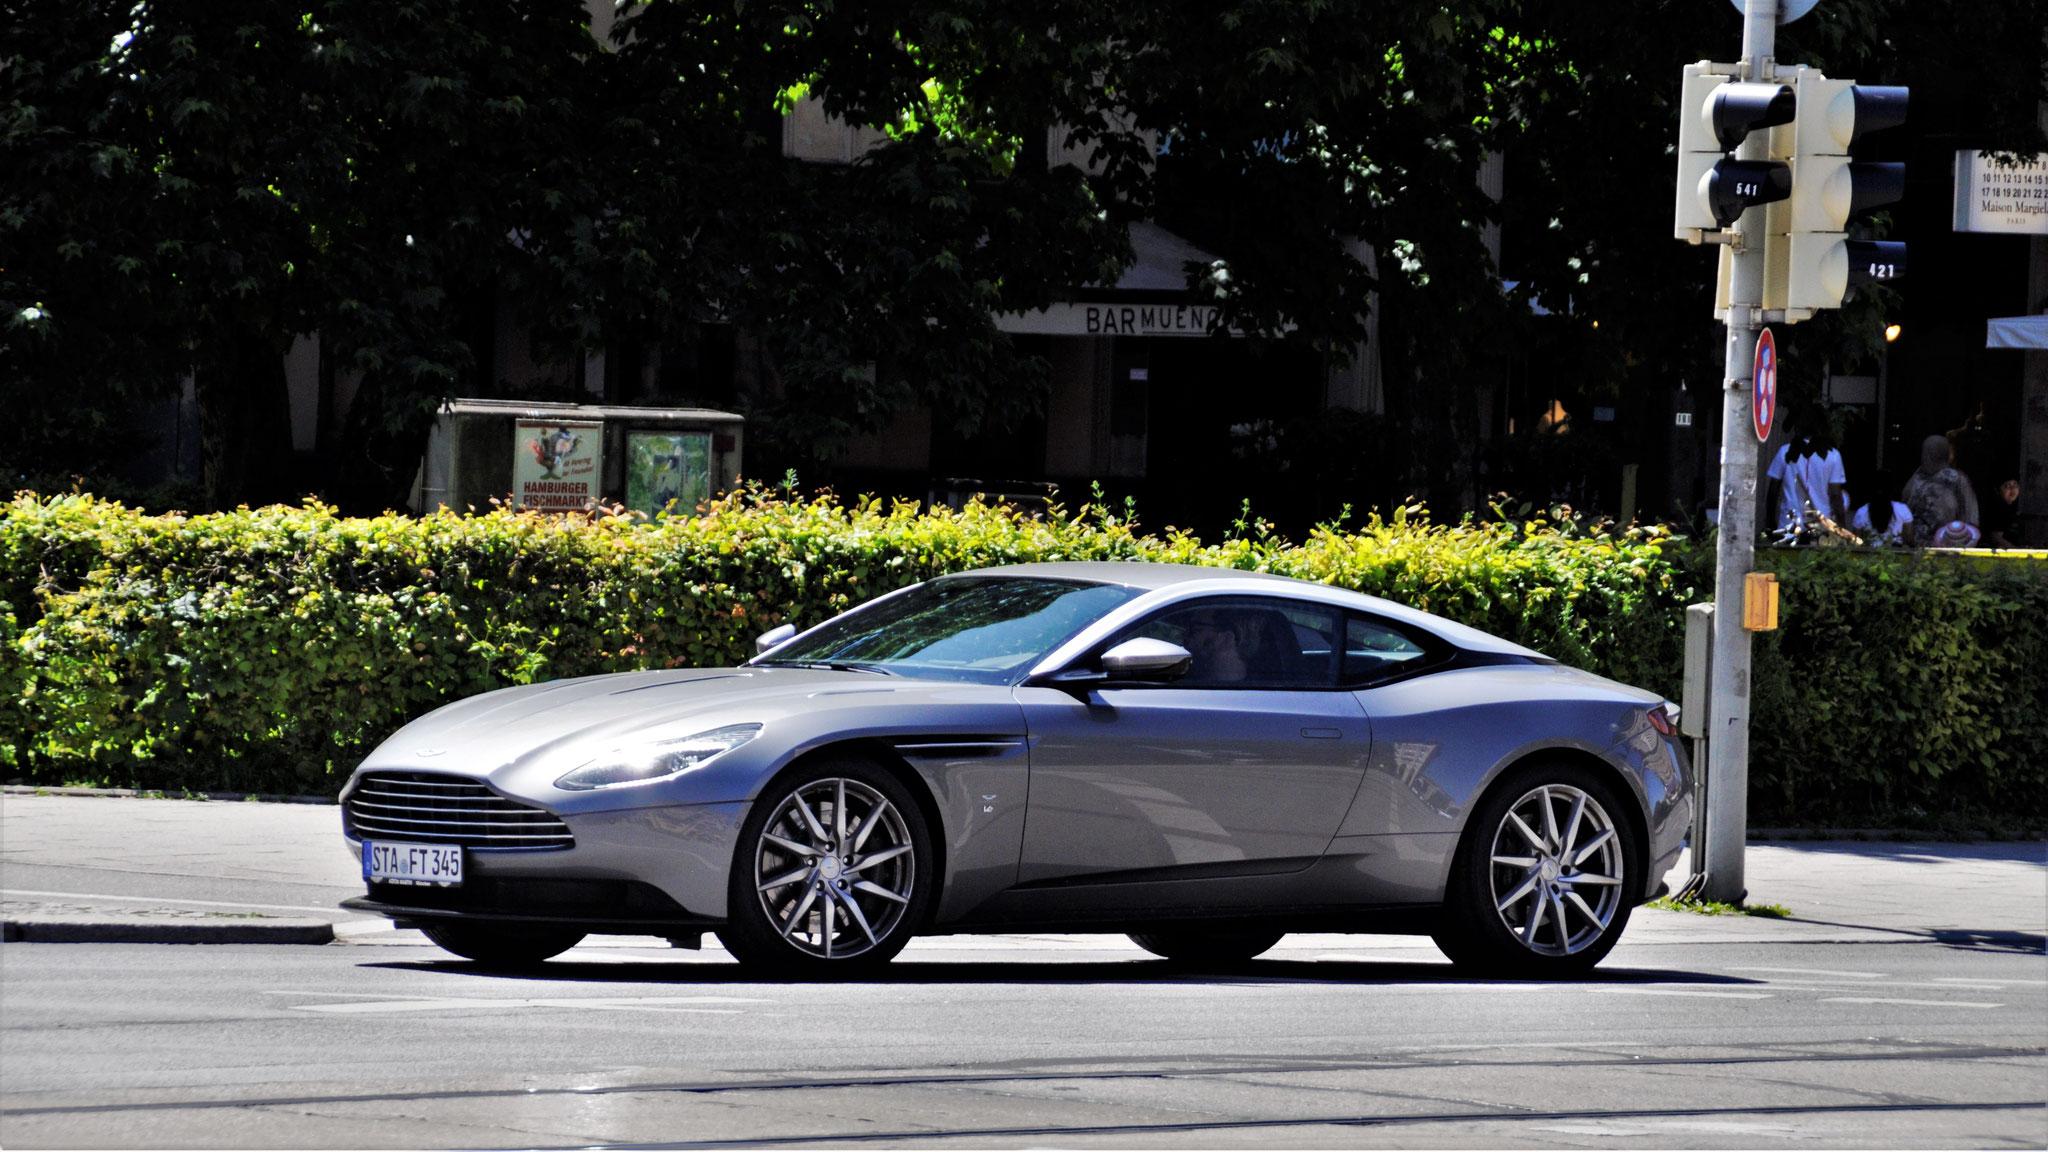 Aston Martin DB11 - STA-FT-345